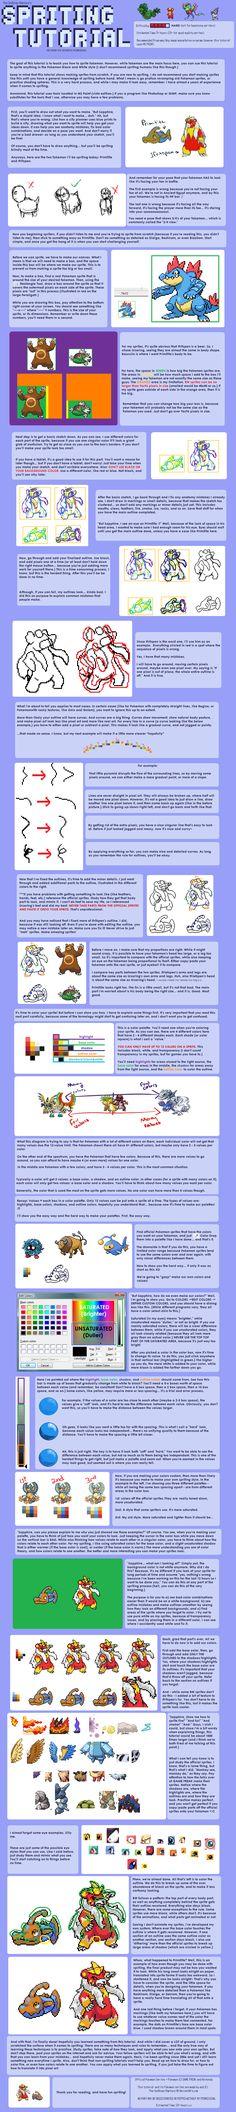 Spriting Fakemon Tutorial V.3 by The-Godlings-Rapture on deviantART